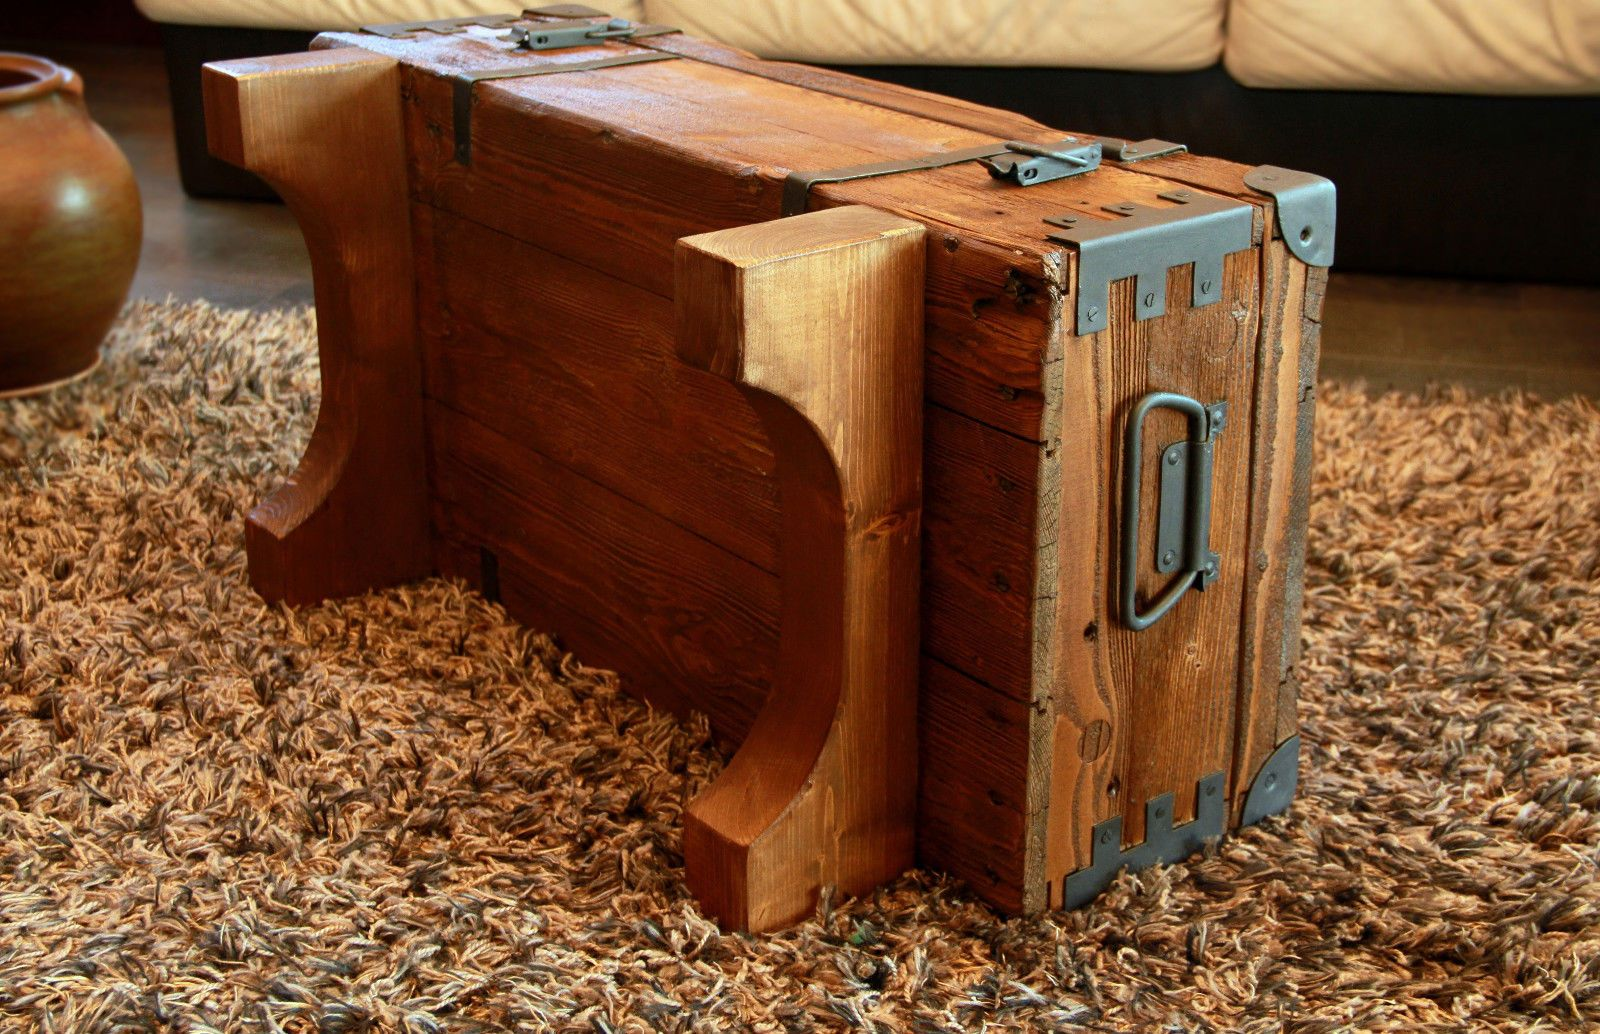 Alte Truhe Kiste Tisch Shabby Chic Holz Beistelltisch Holztruhe Couchtisch 16 12